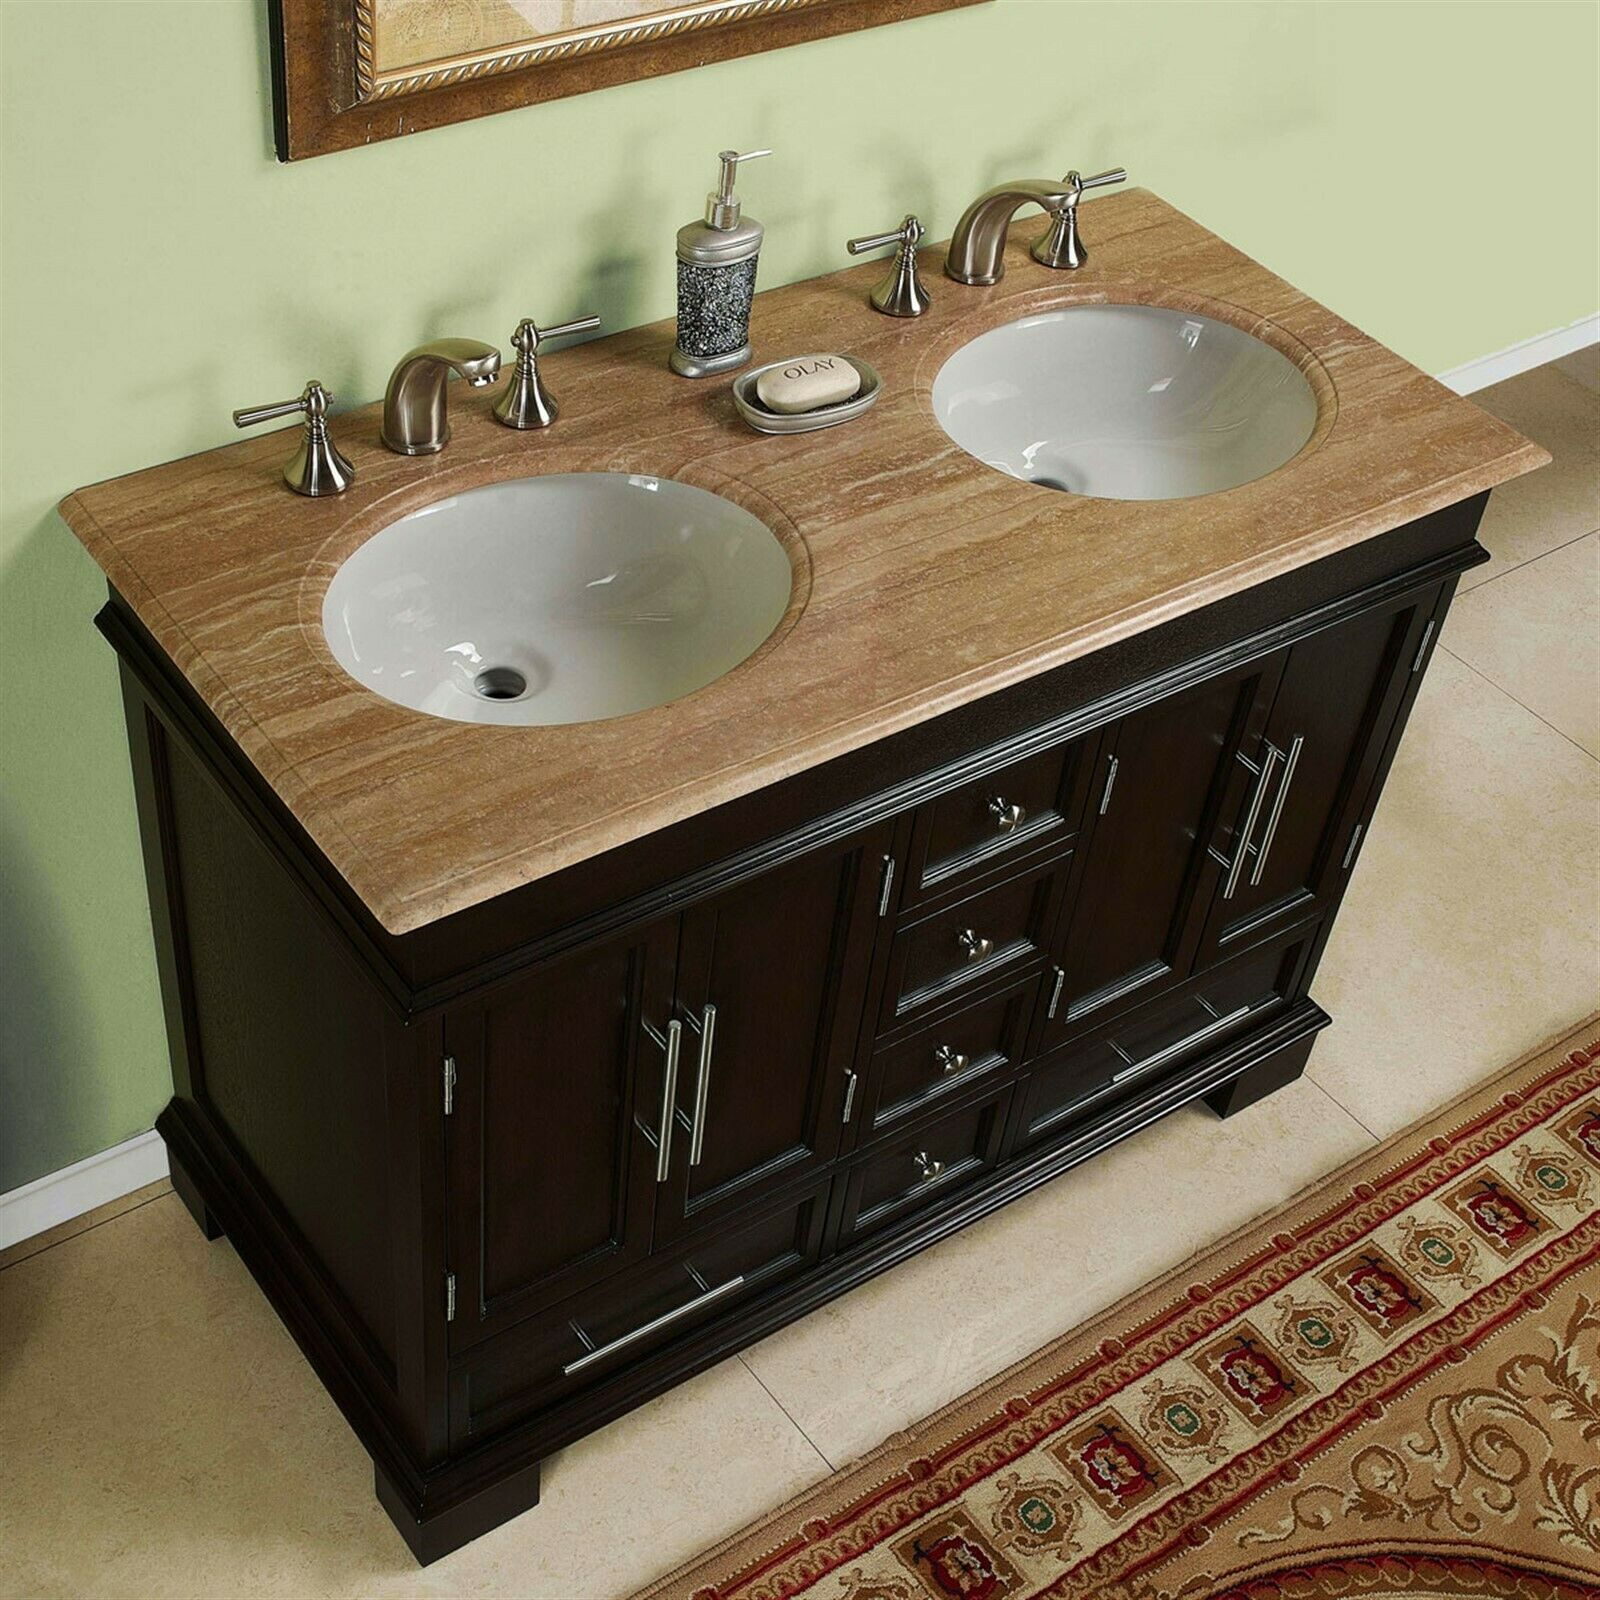 Silkroad Exclusive Hyp 0224 Uwc 48 Double Sink Vanity With Travertine Top Brown For Sale Online Ebay